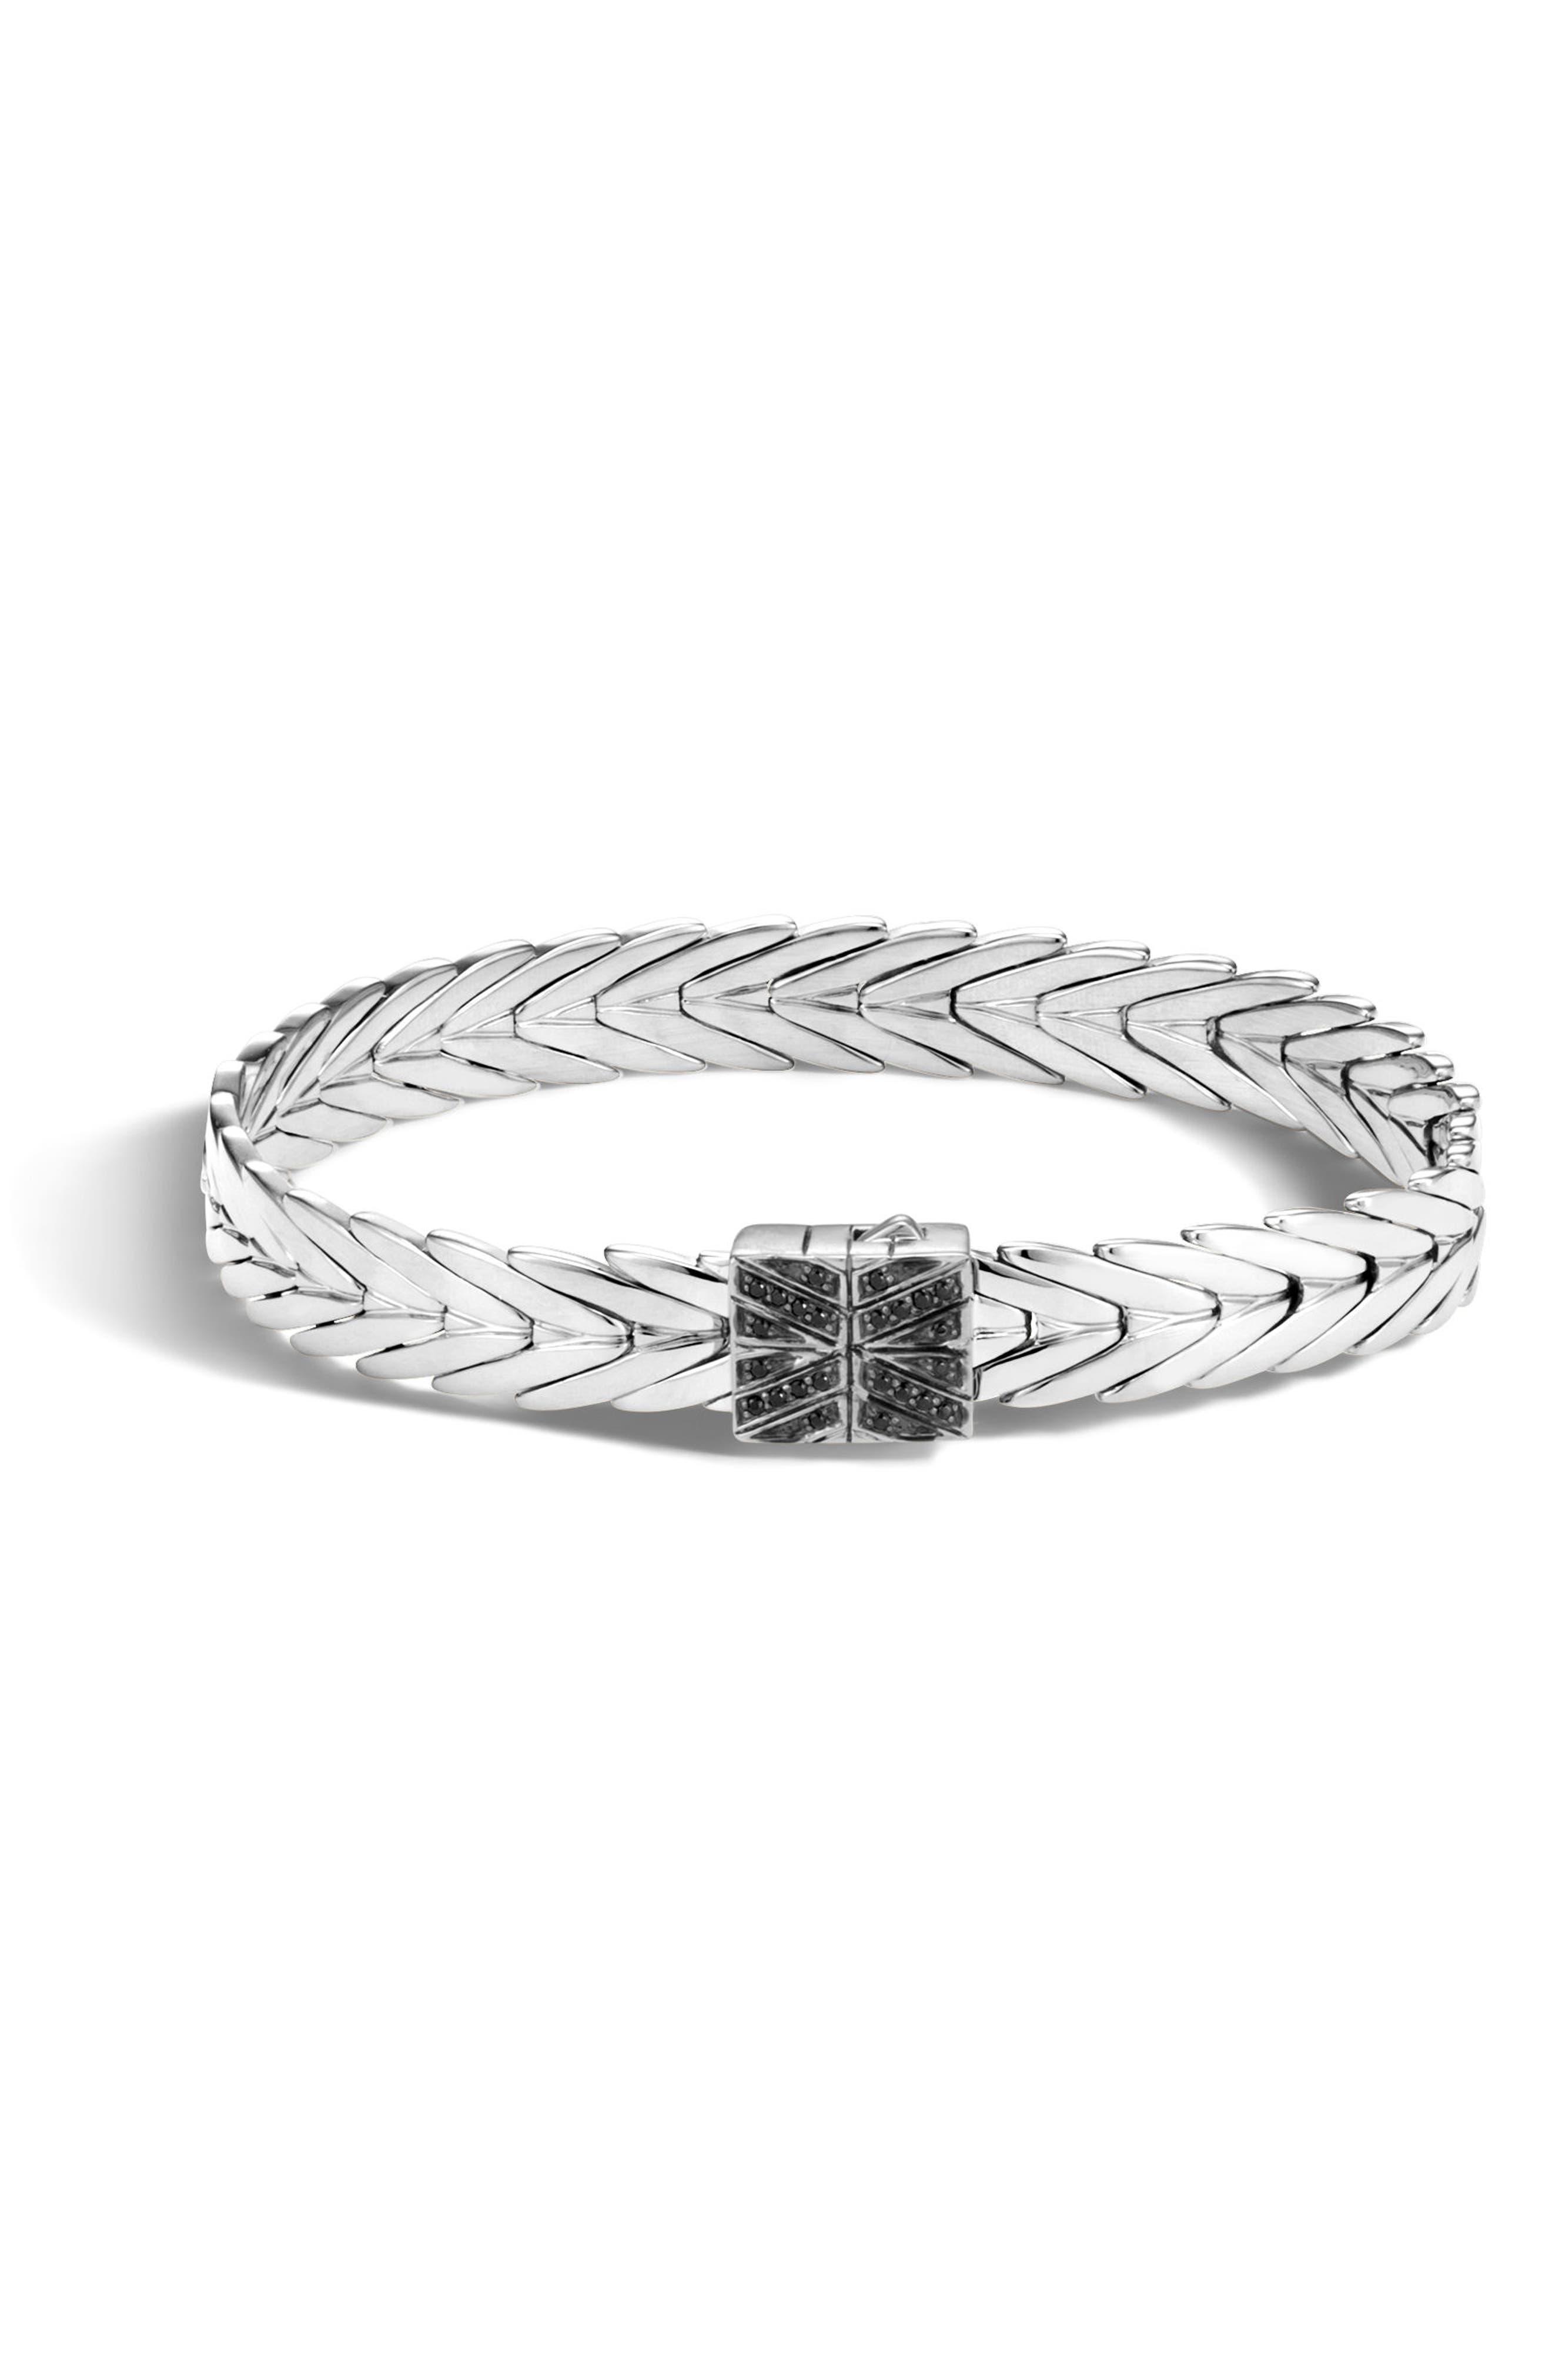 Modern Chain Bracelet with Black Spinel,                         Main,                         color, Silver/ Black Spinel